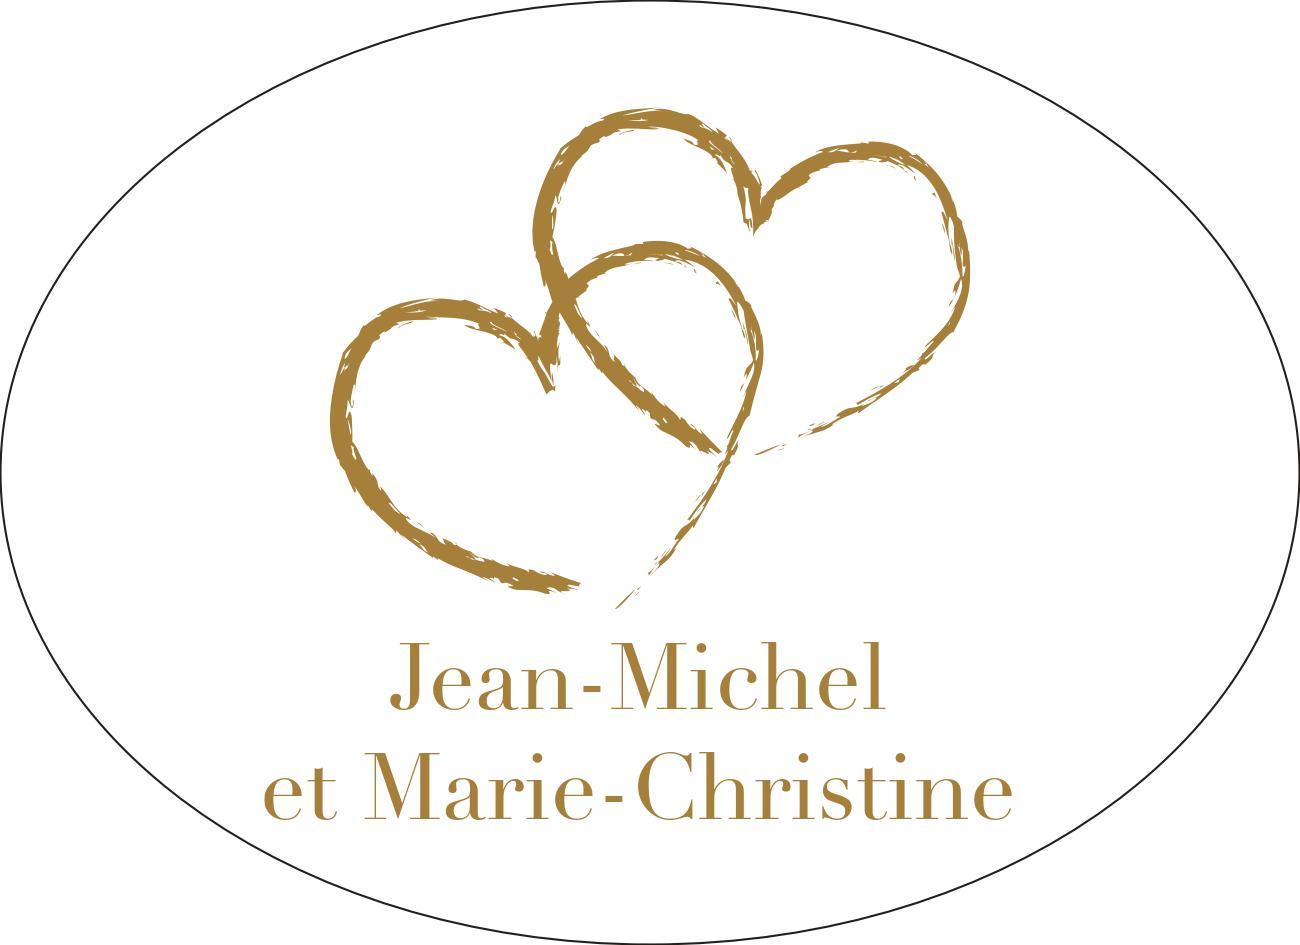 wedding-jean-michel-marie-christine